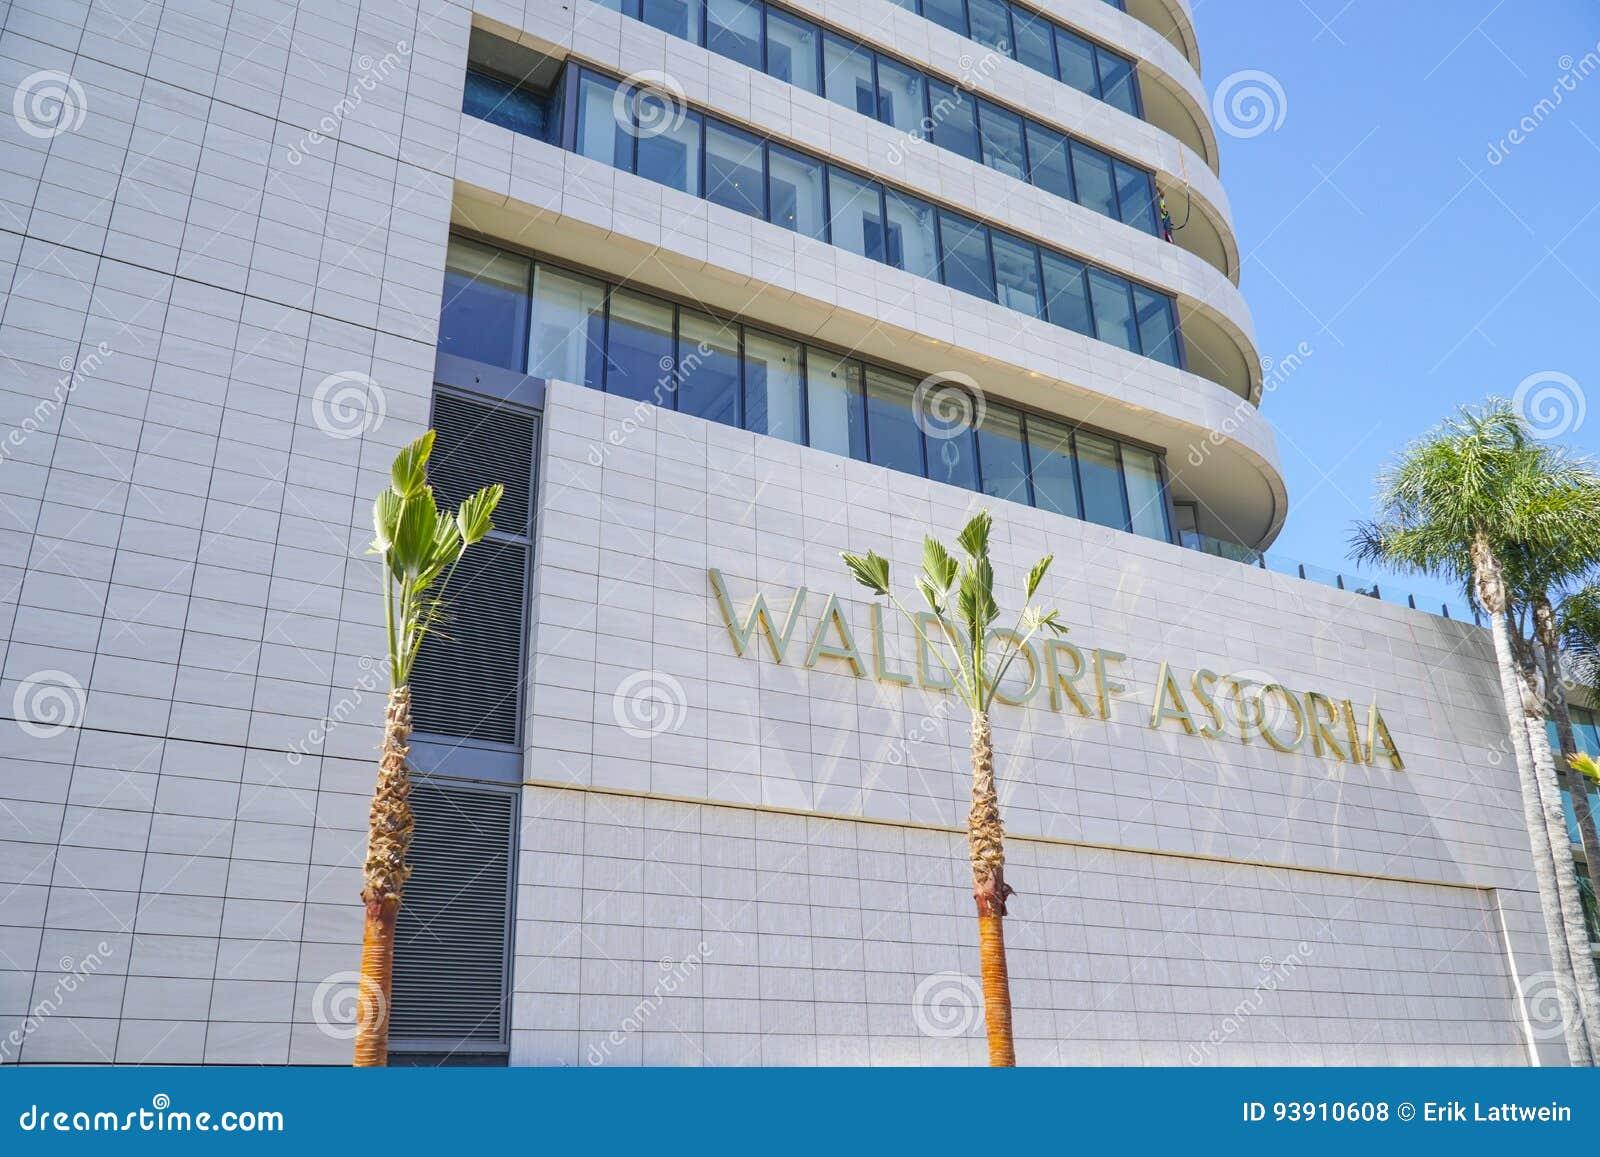 - 20, 2017 Waldorf Astoria hotel w Beverly Hills, LOS ANGELES, KALIFORNIA, KWIETNIU -